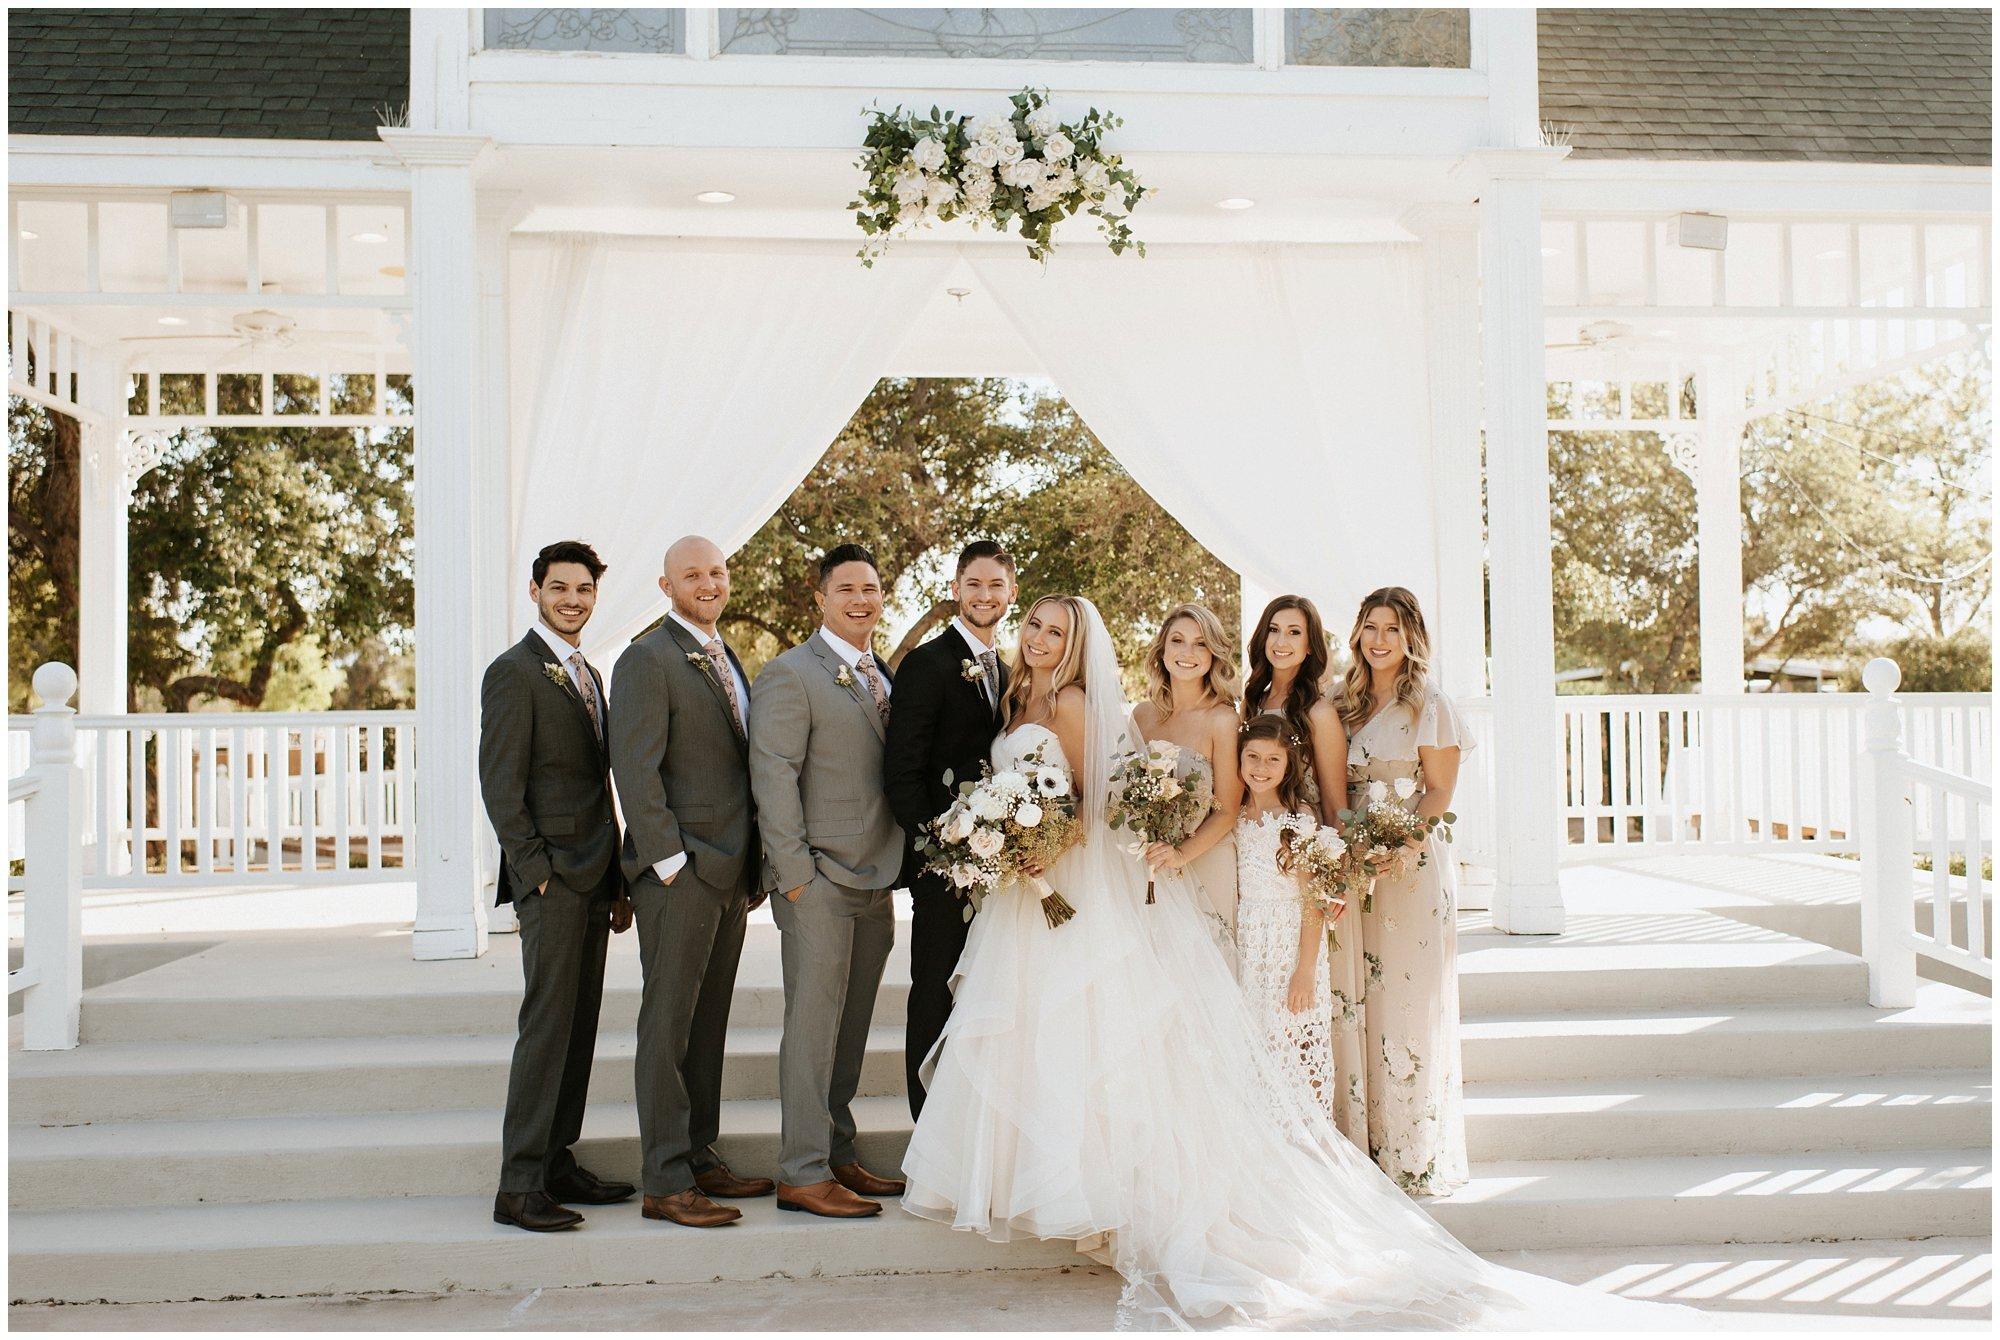 Wedgewood_Lindsay_Groves-Arizona-Wedding-Photographer-M+C_0020.jpg